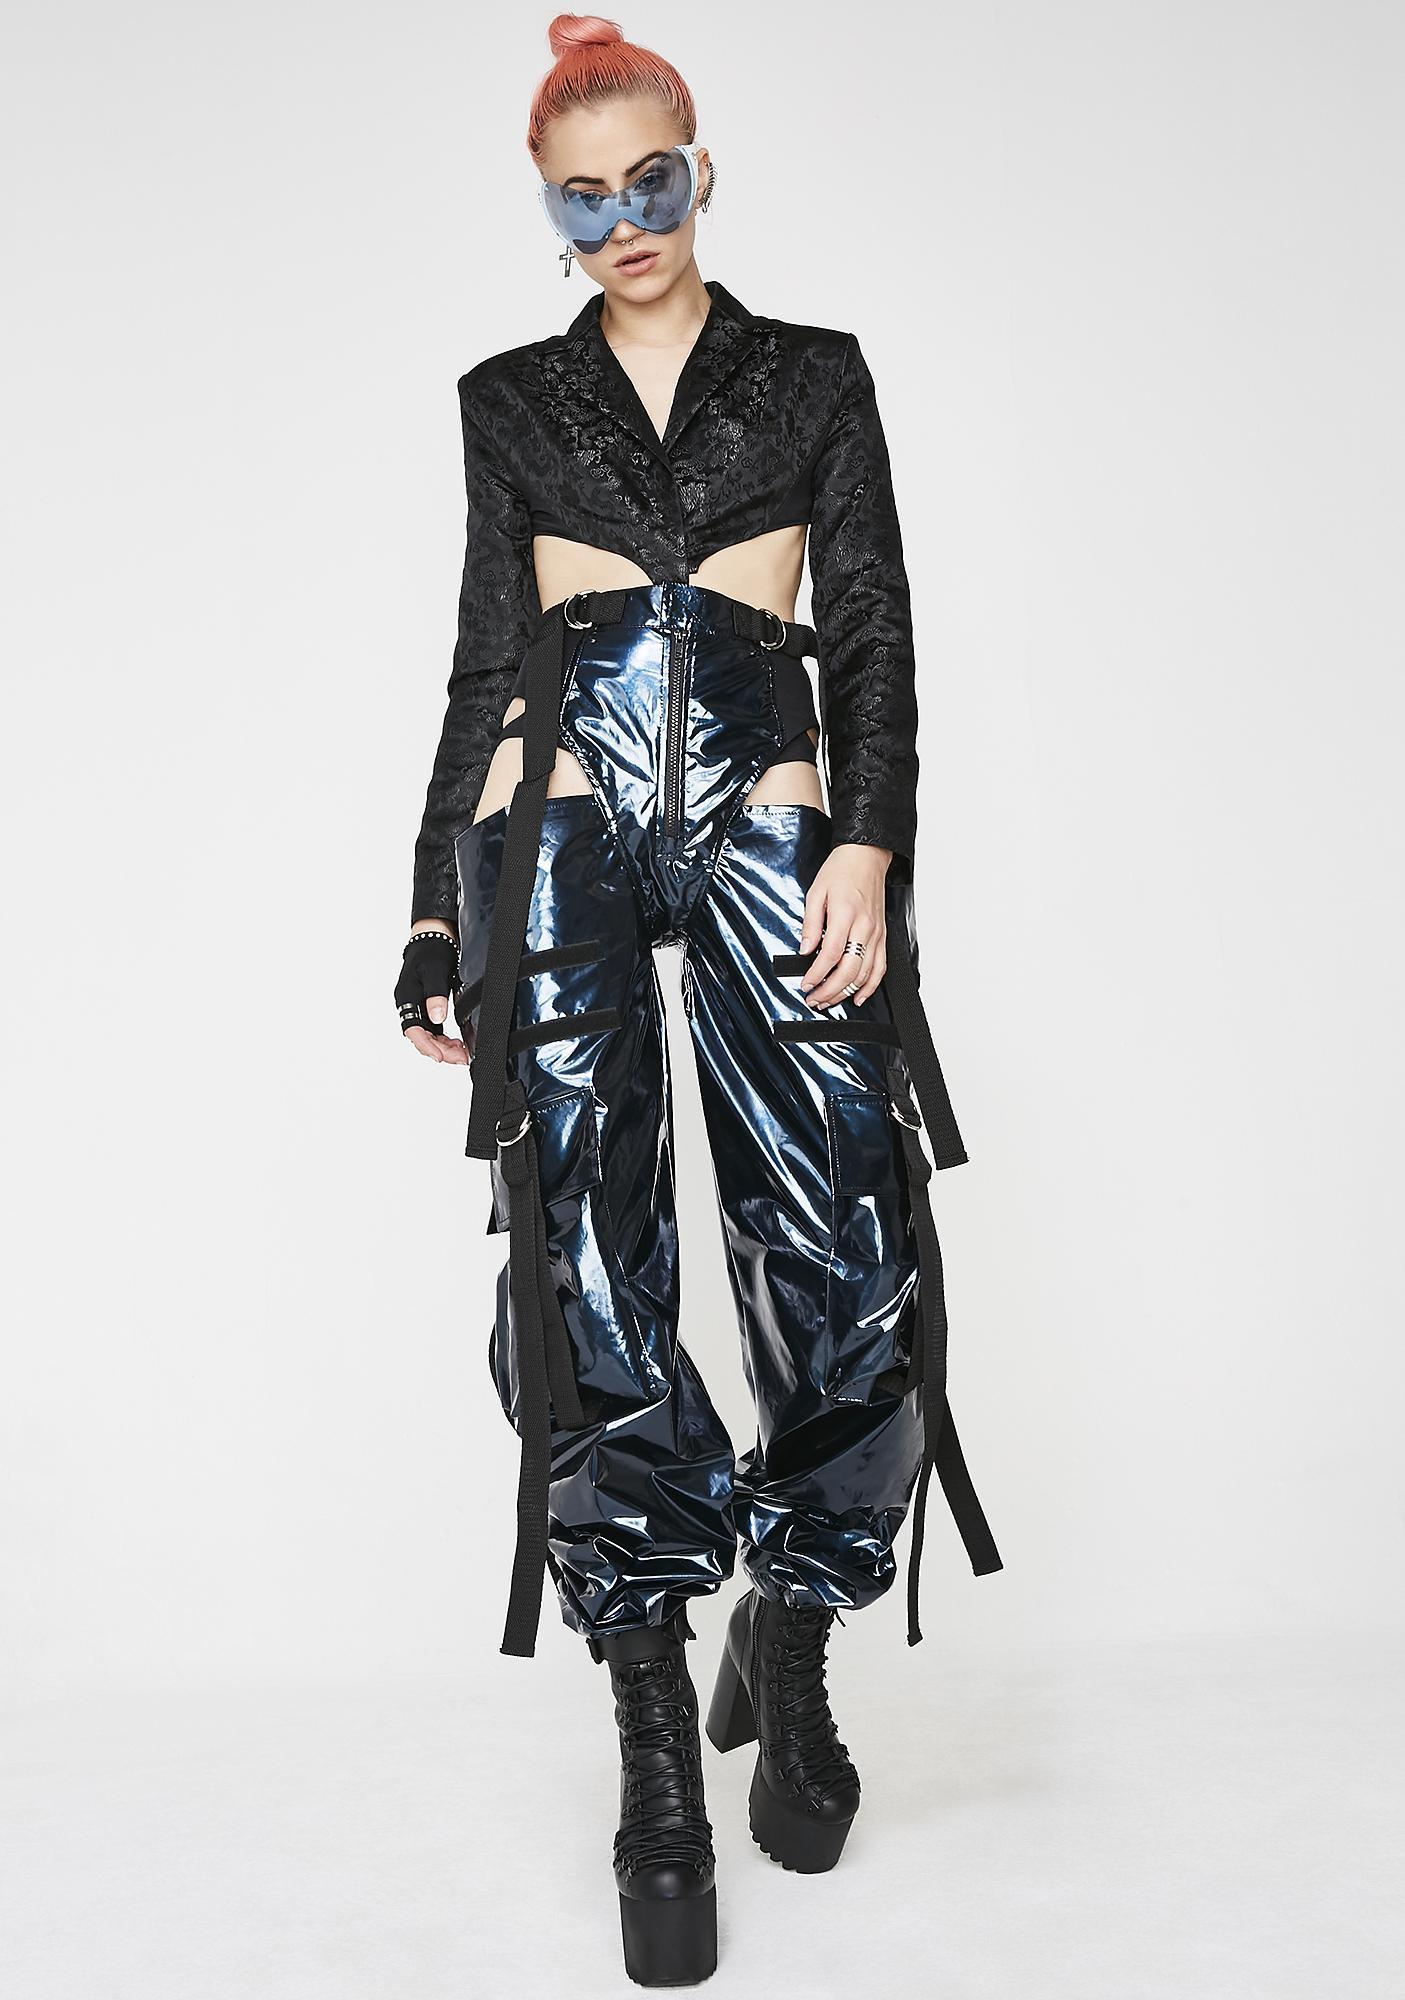 Namilia Black Dragon Brocade GoGo Suit